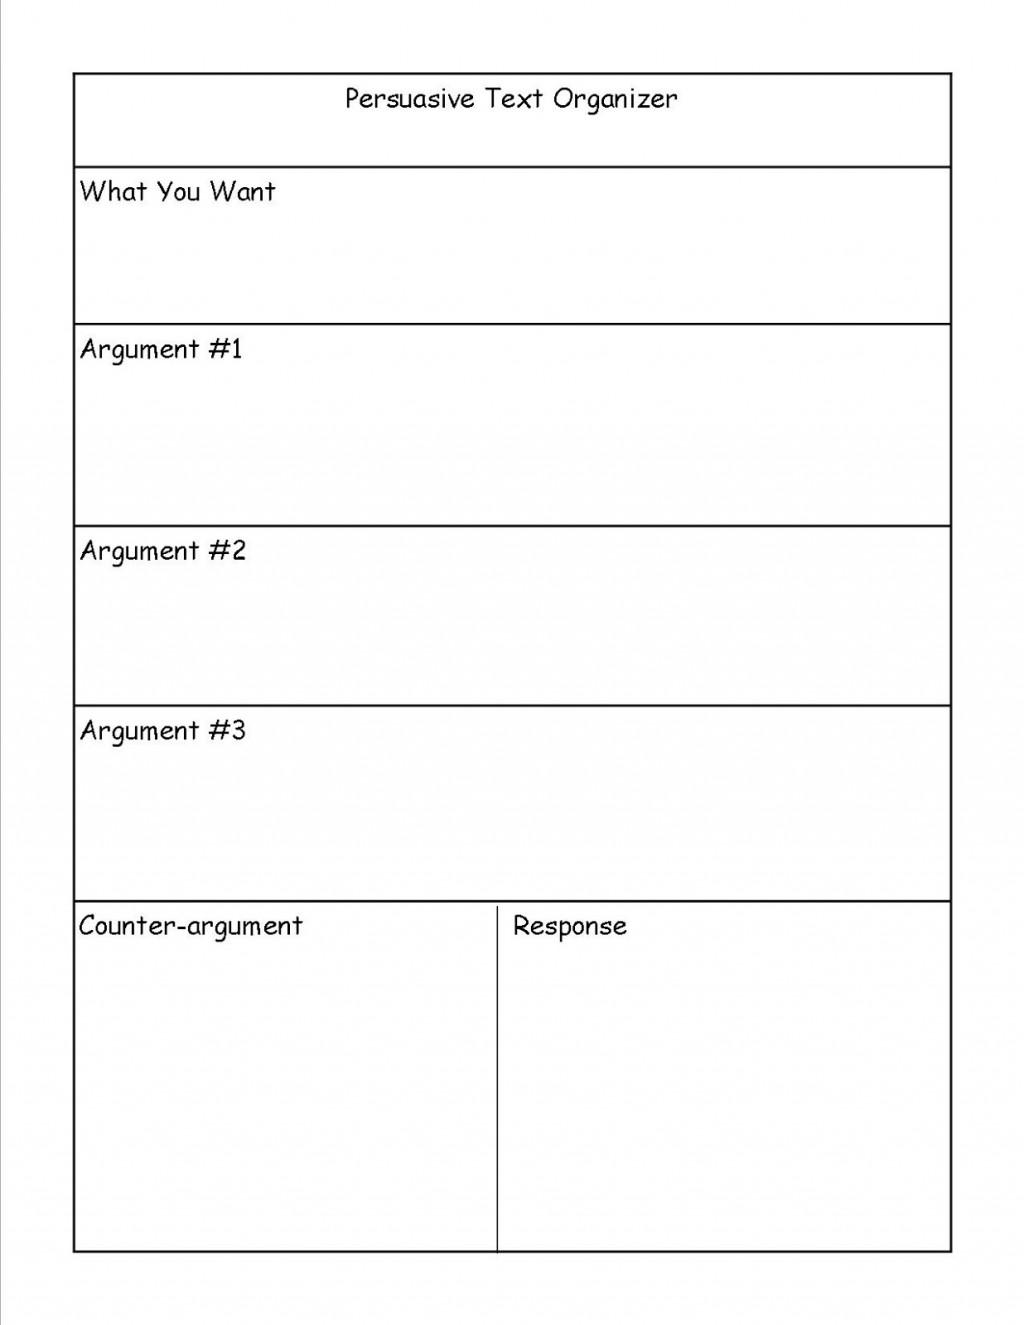 027 College Essay Organizer Example Surprising Application Graphic Organizers Argumentative Large